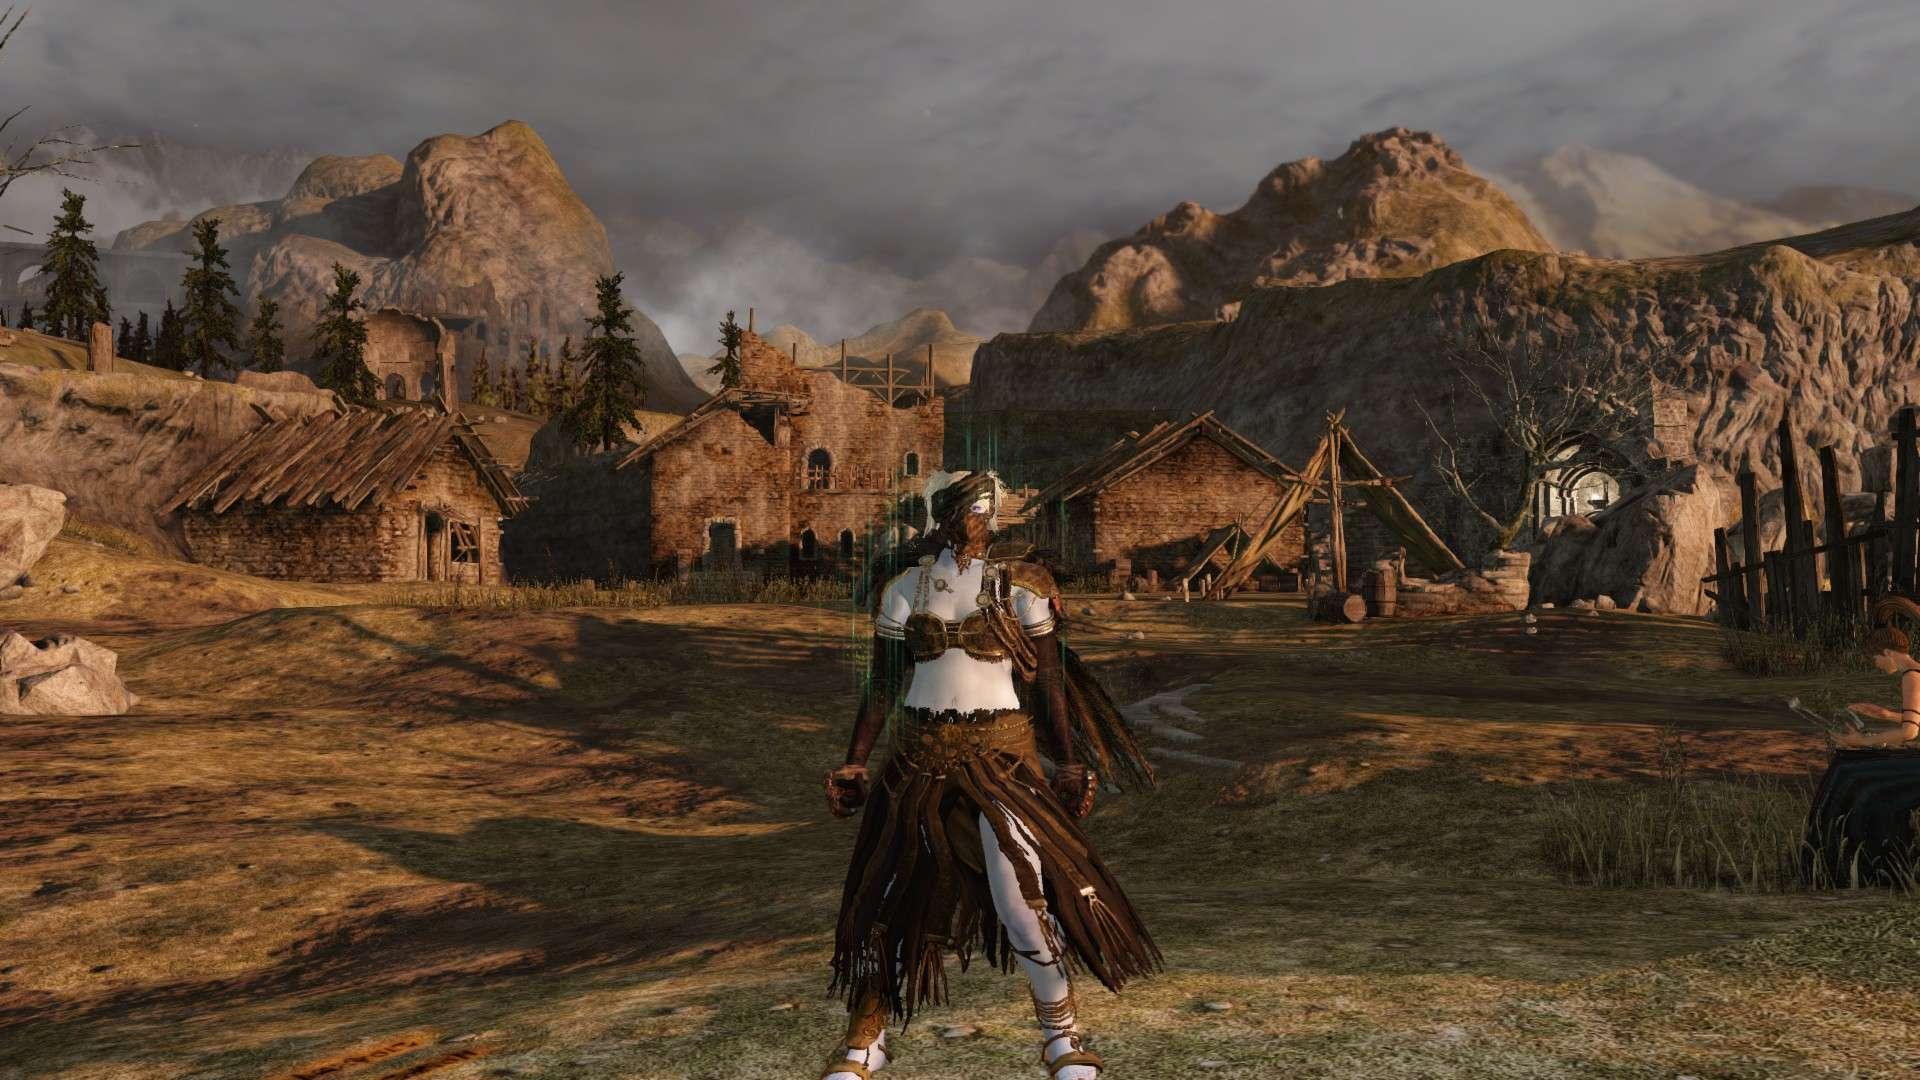 Dark Souls 3 Wallpaper 1080p: Dark Souls Wallpaper HD